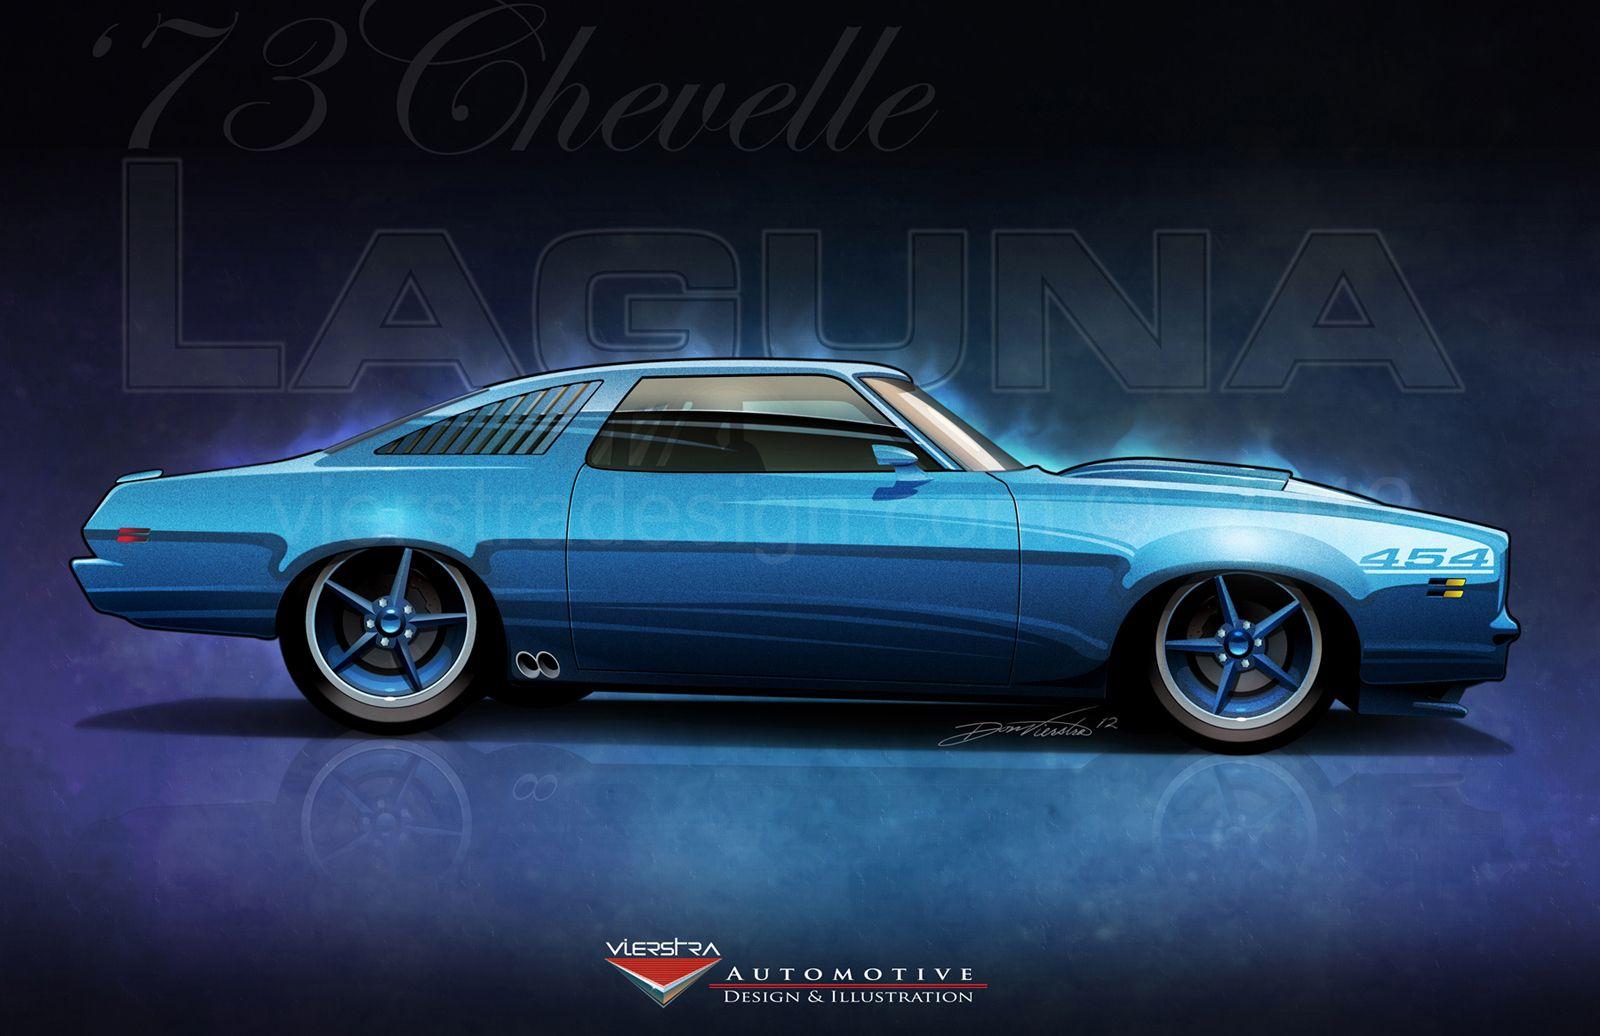 1973 Chevelle Laguna Custom Rendering Vierstradesign Com C 2012